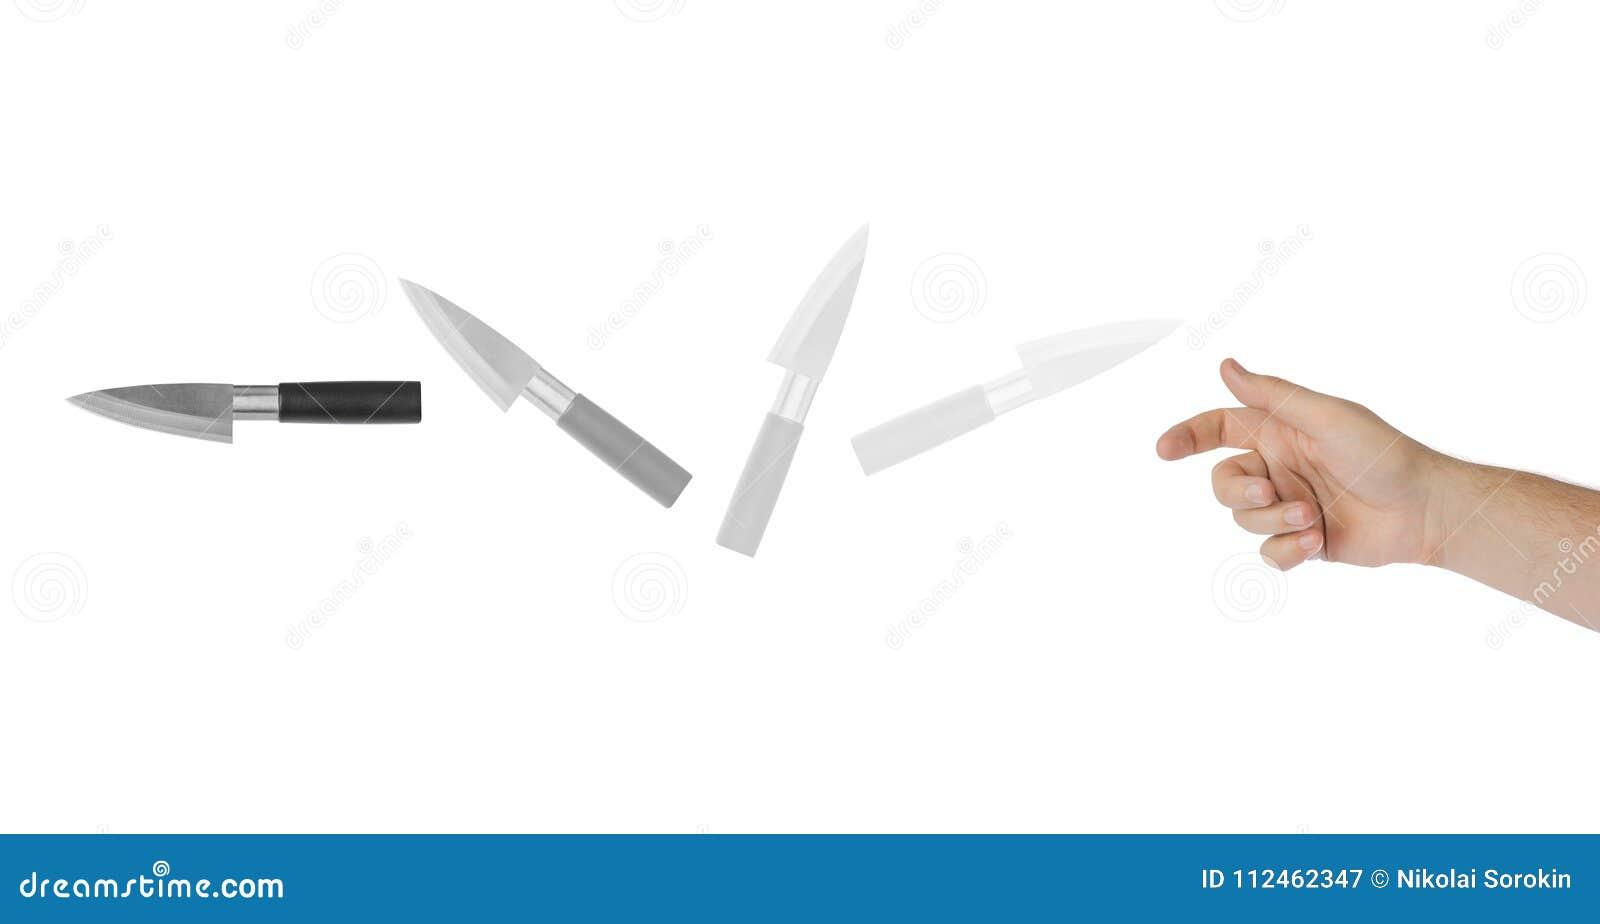 Рука бросает нож